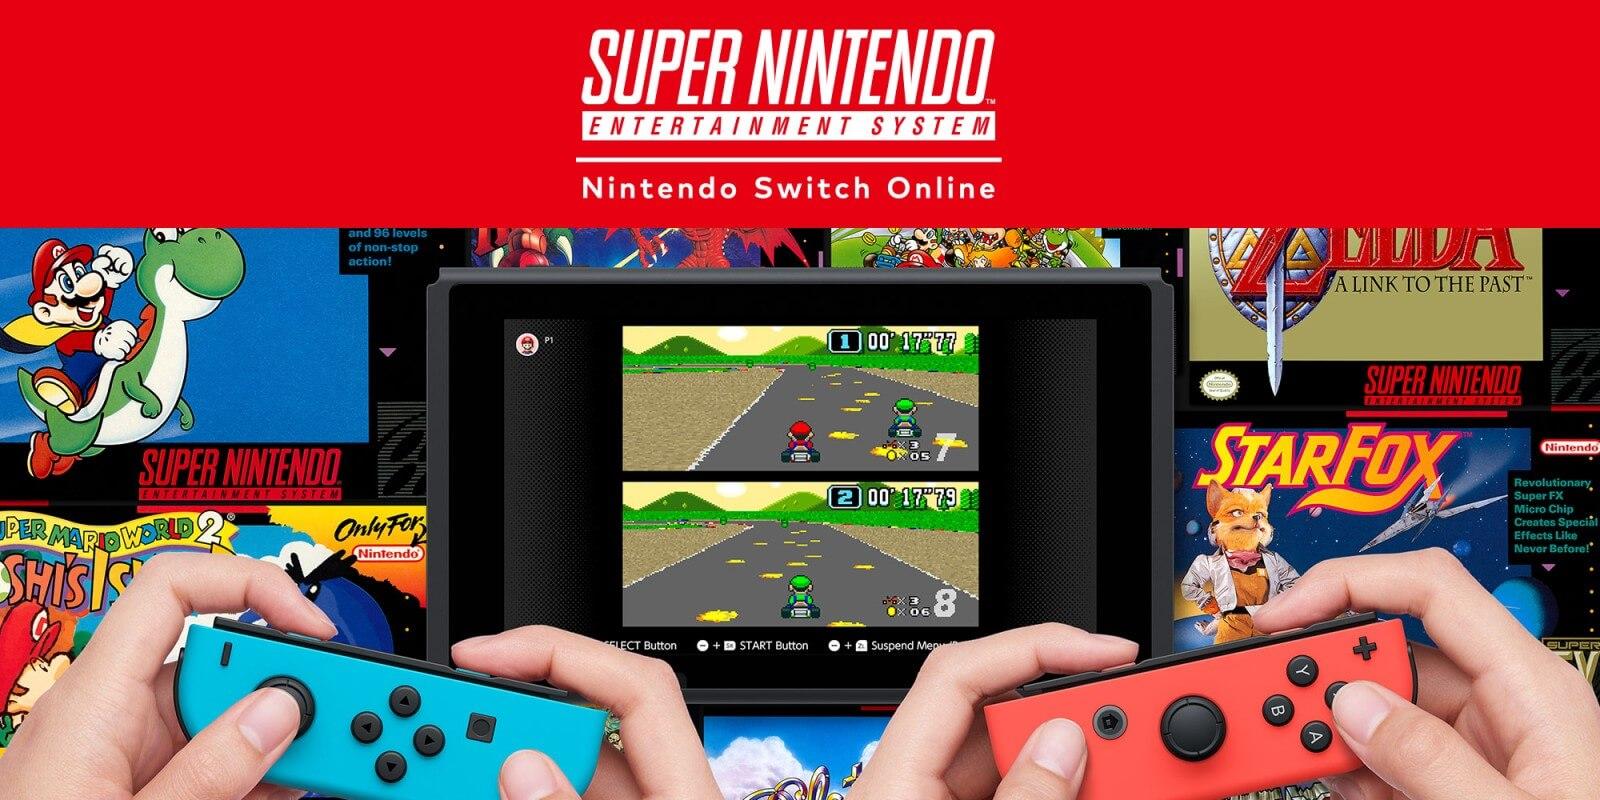 Nintendo Switch Online - SNES games